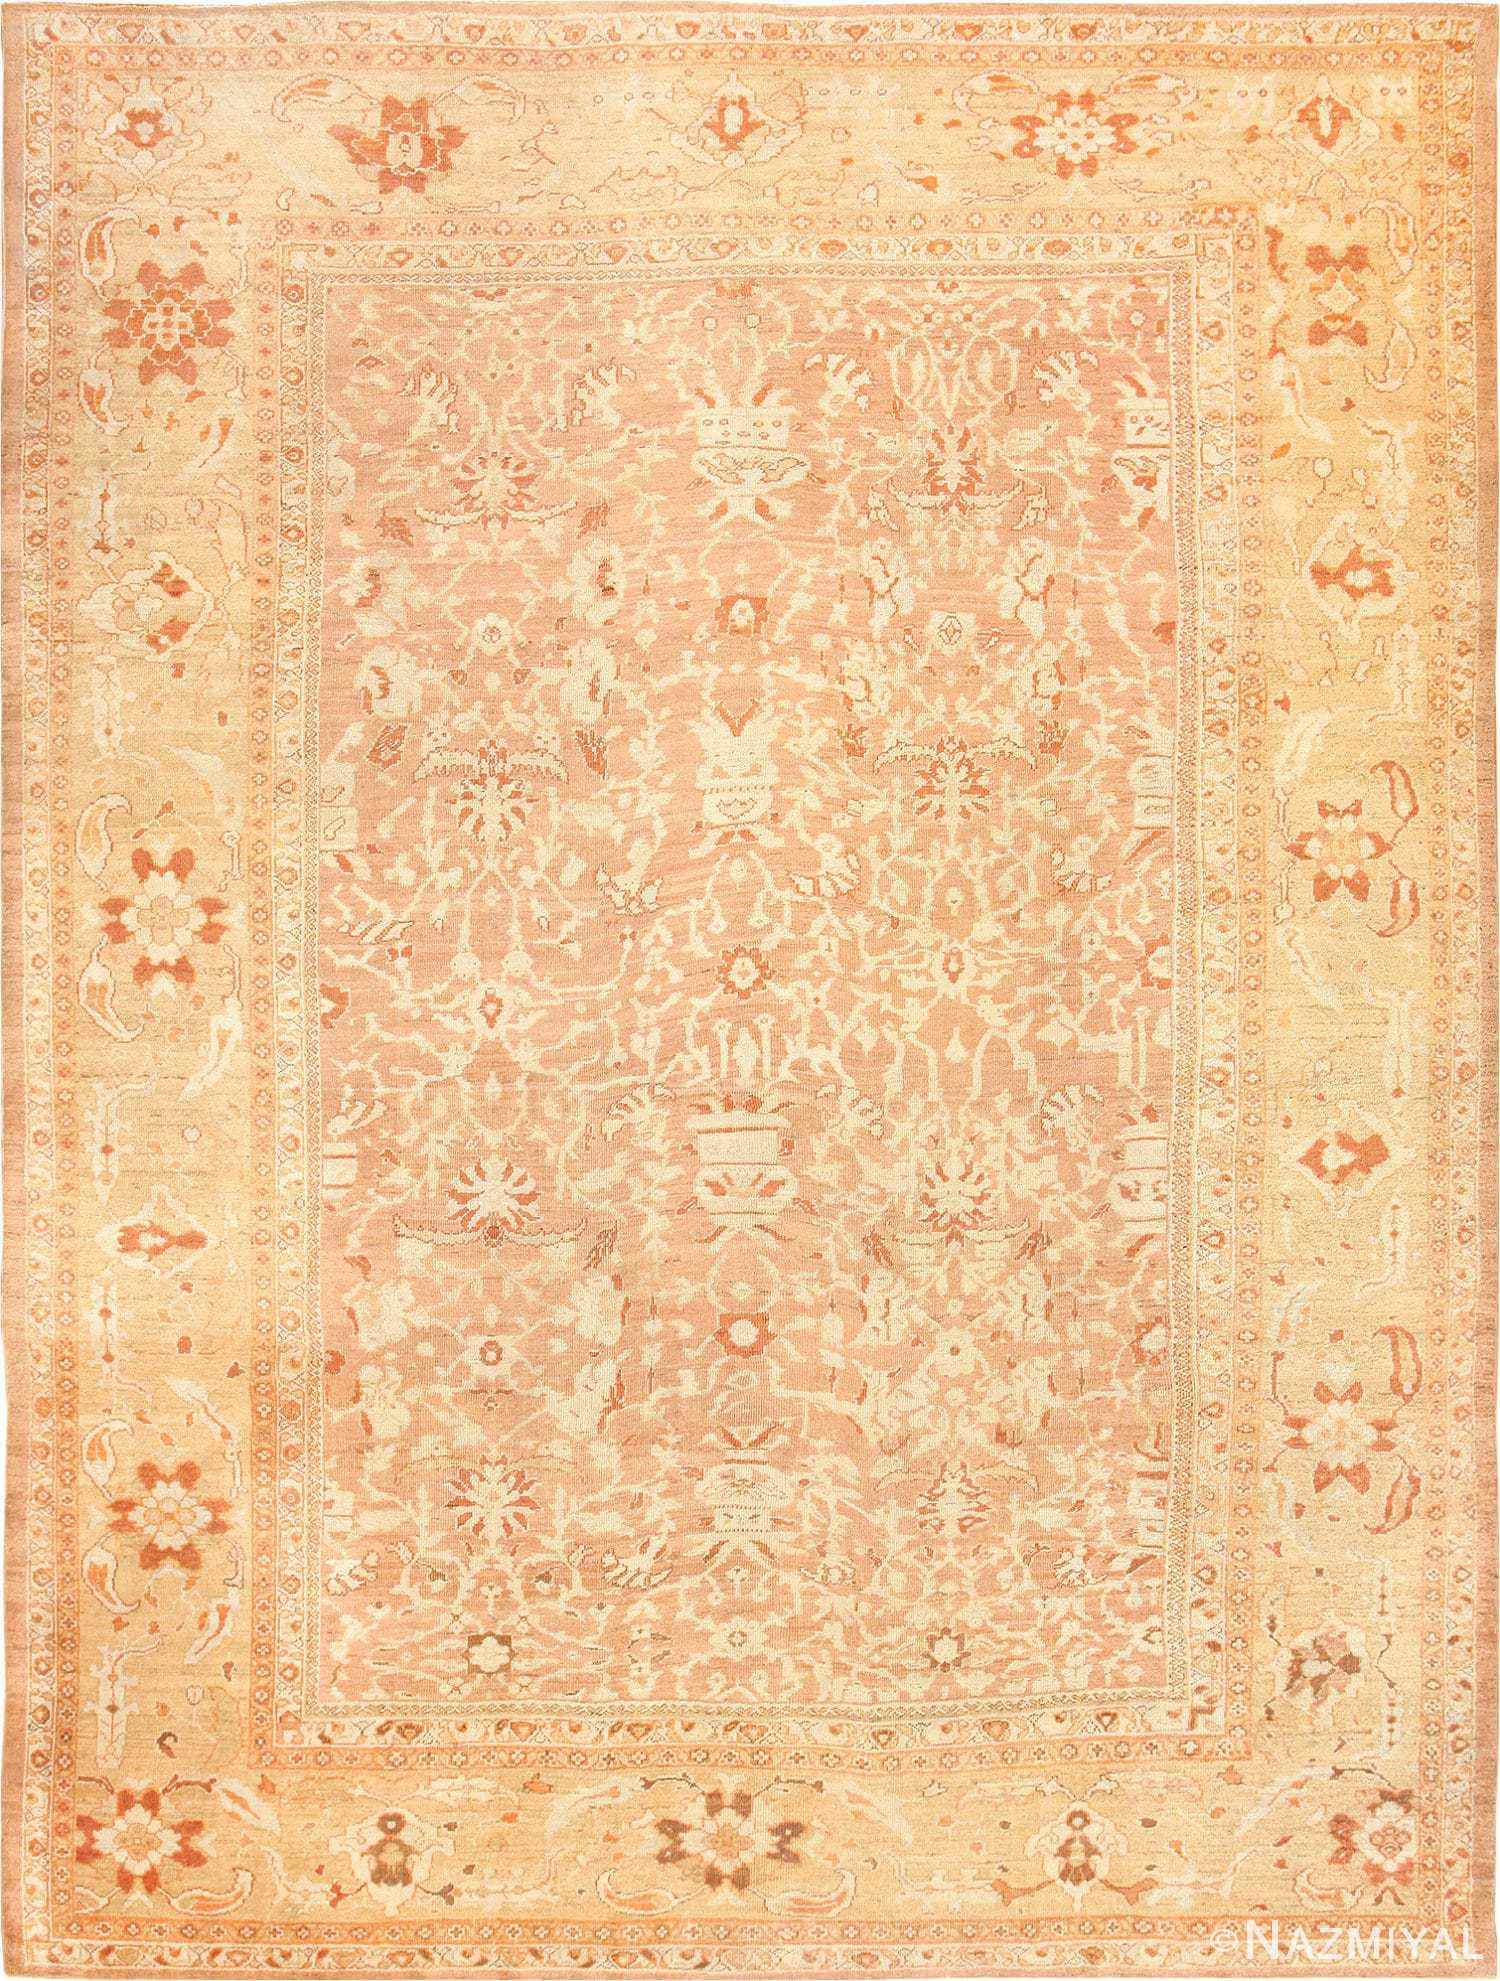 Large Decorative Antique Persian Ziegler Sultanabad Rug 48762 Nazmiyal